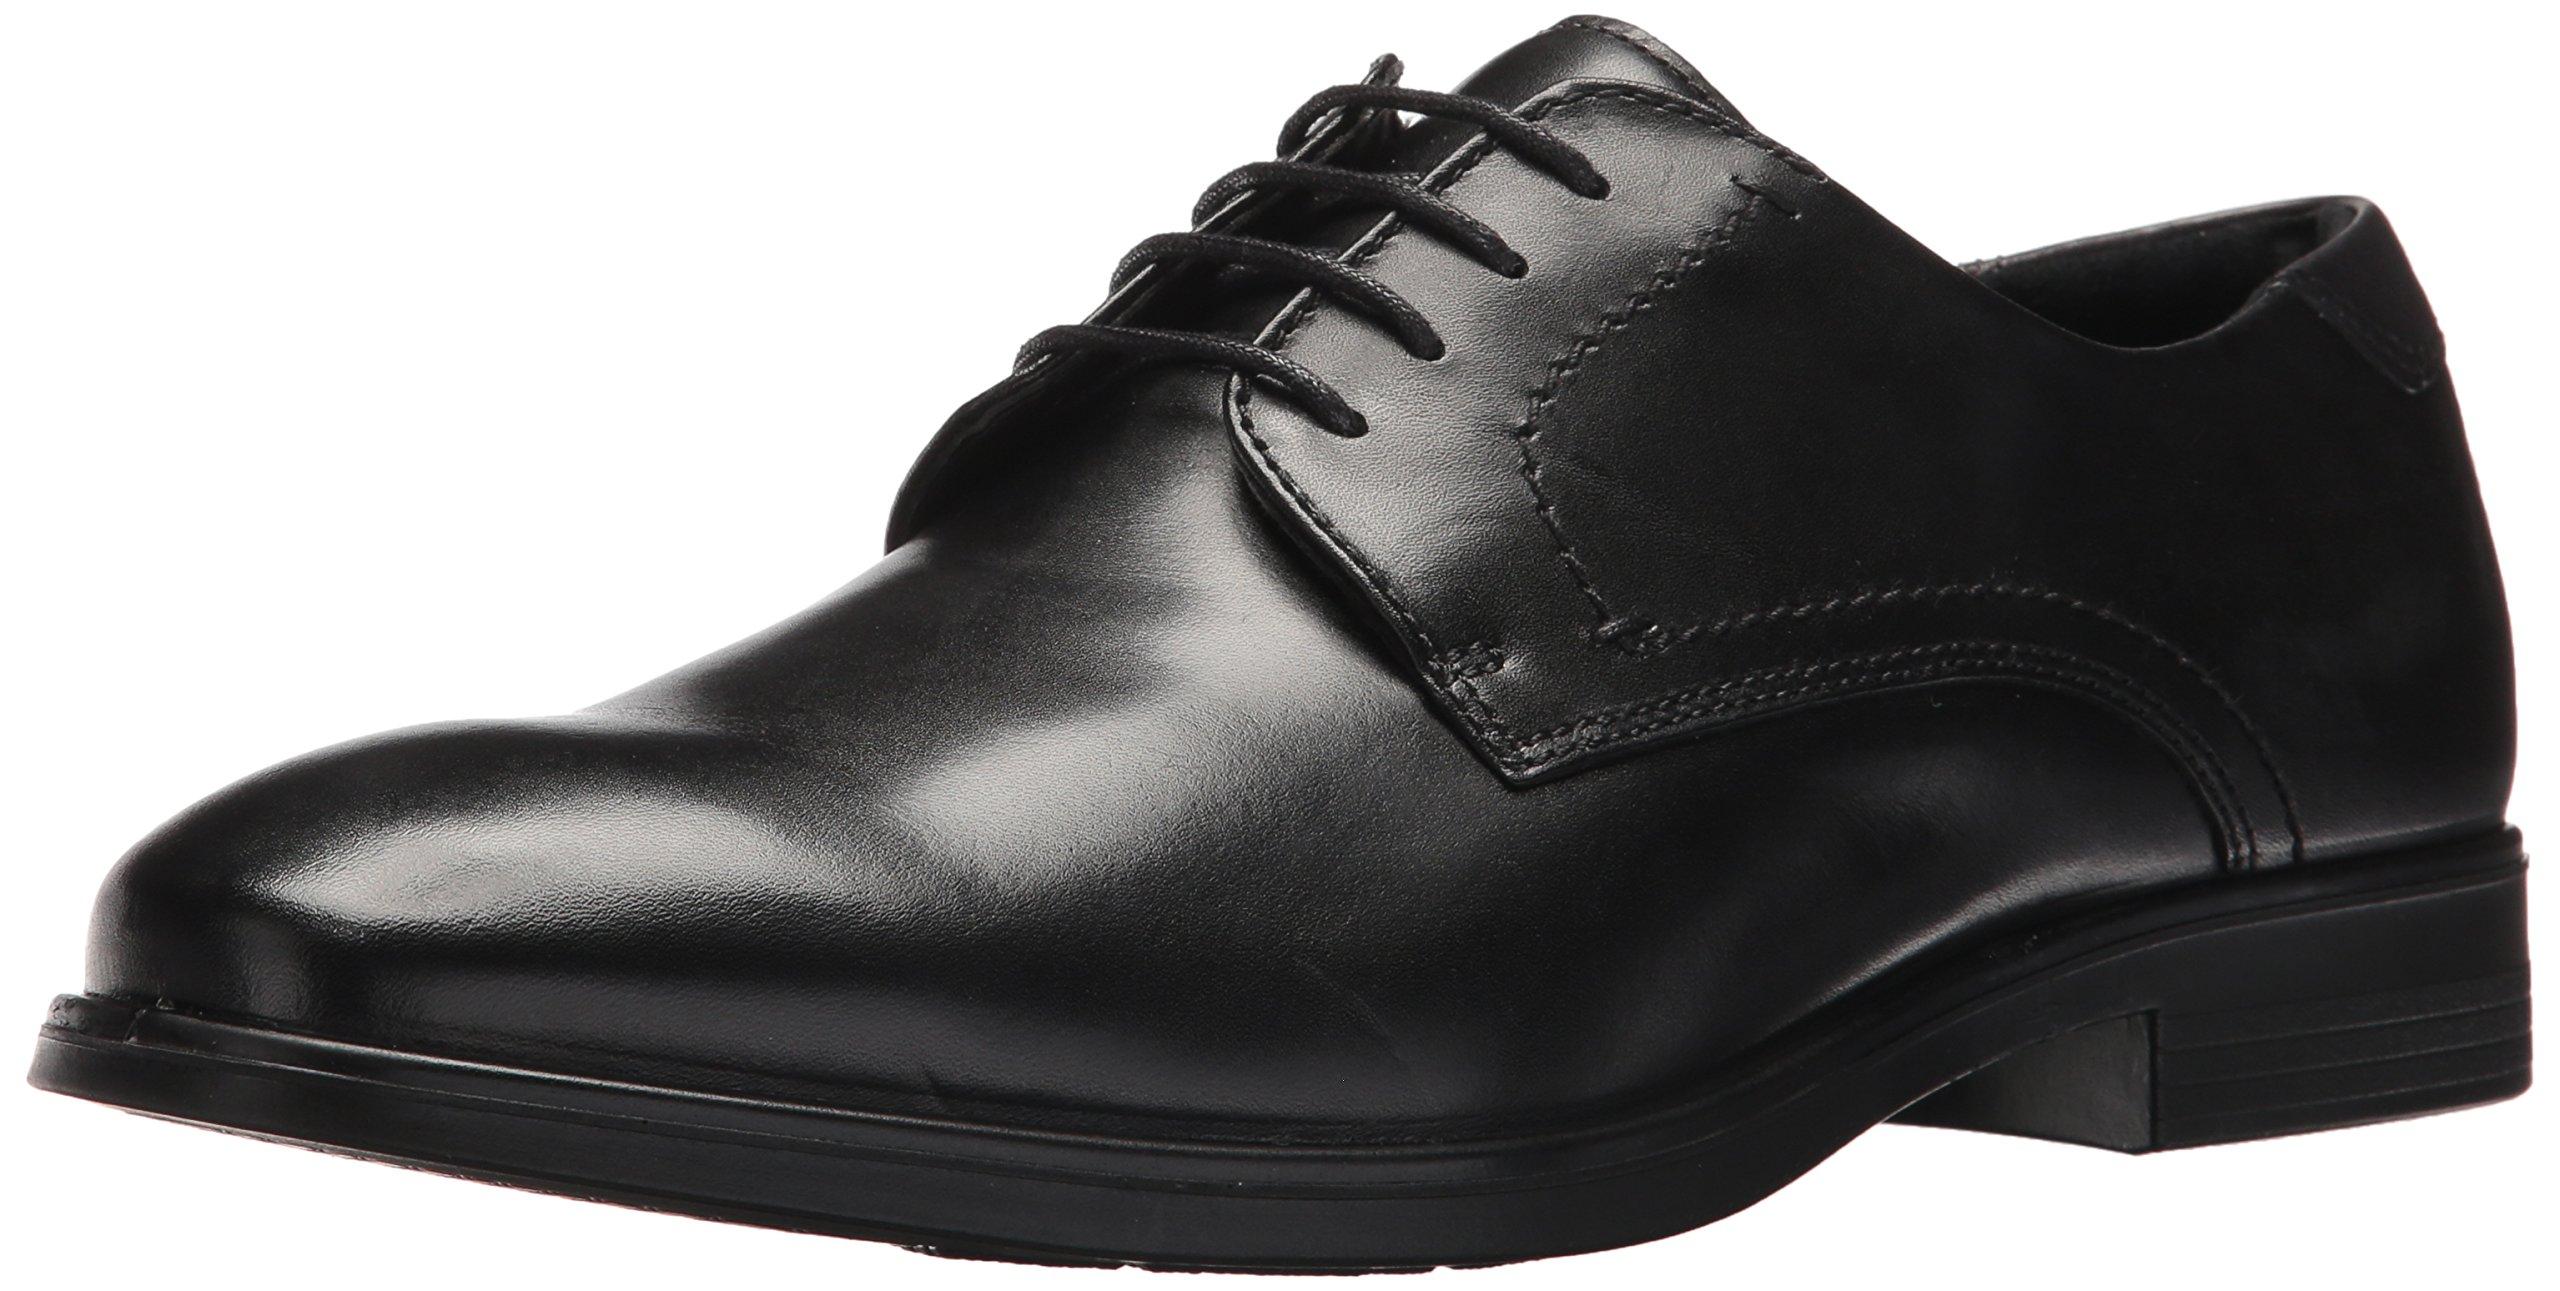 ECCO Men's Melbourne Tie Oxford, Black/Magnet, 40 EU/6-6.5 M US